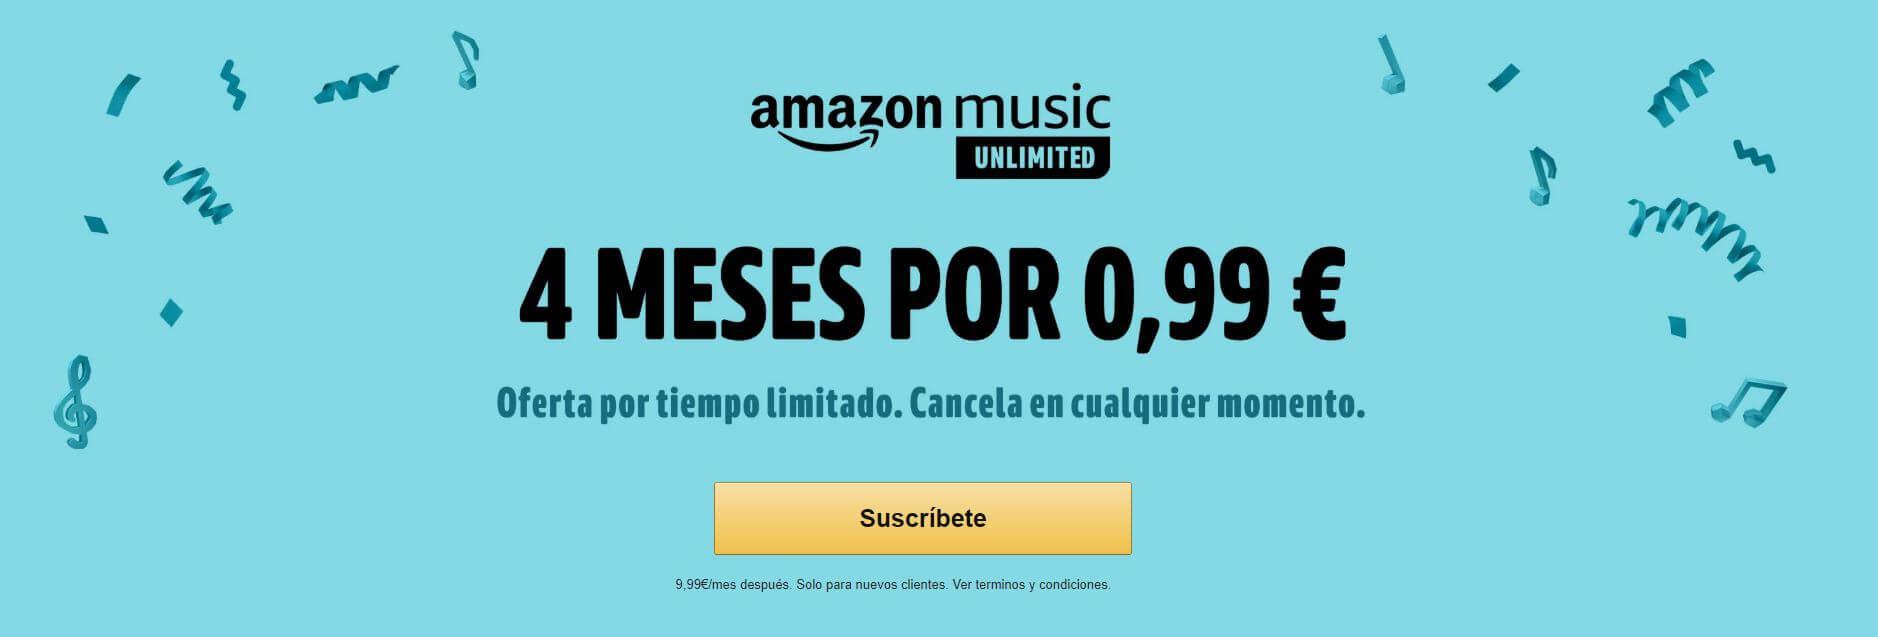 amazon music unlimited 4 meses